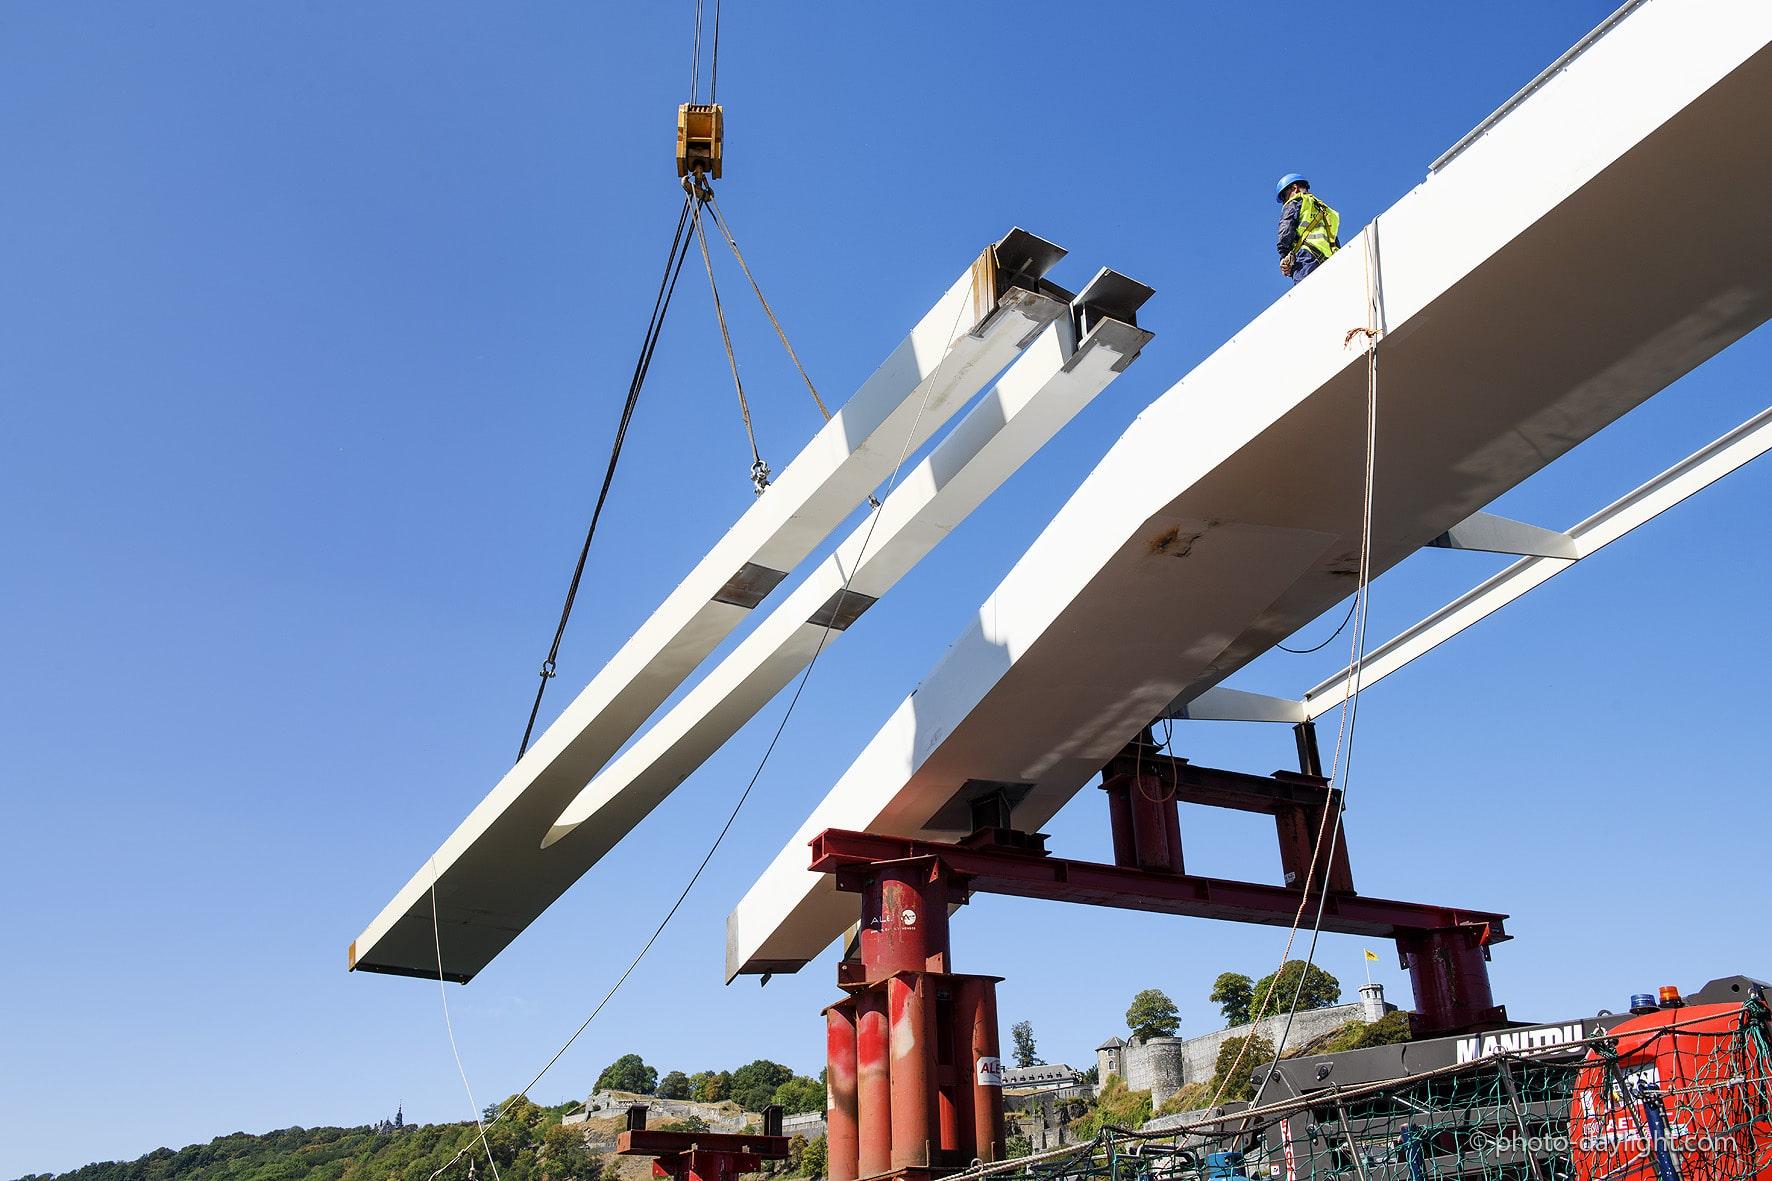 Bureau greisch namur prepares to welcome the enjambée footbridge